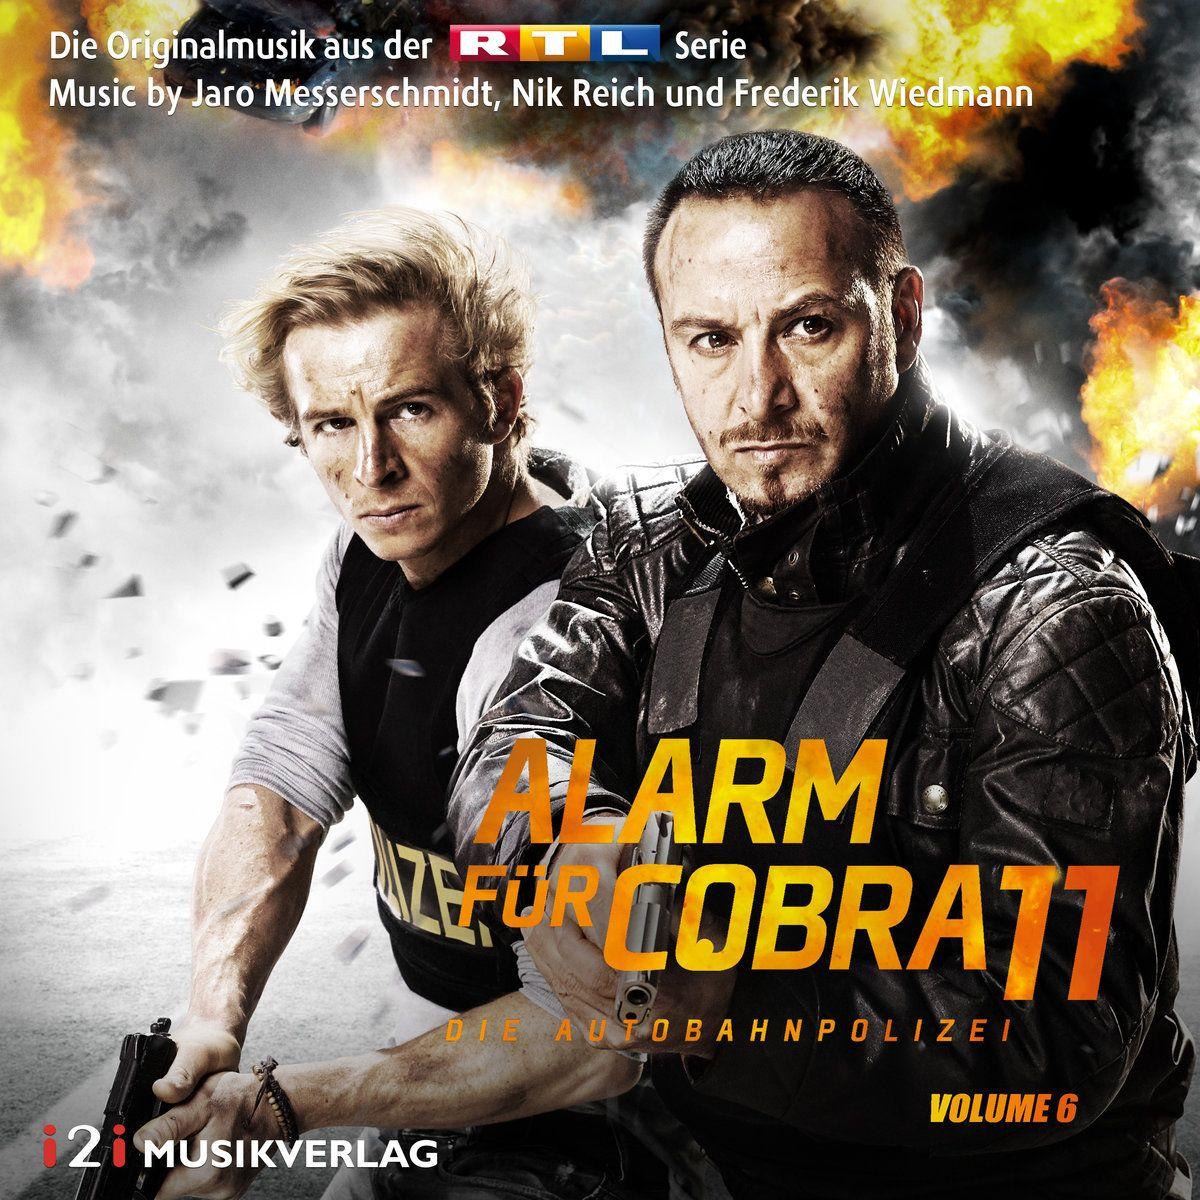 Alarm Für Cobra 11 Stream